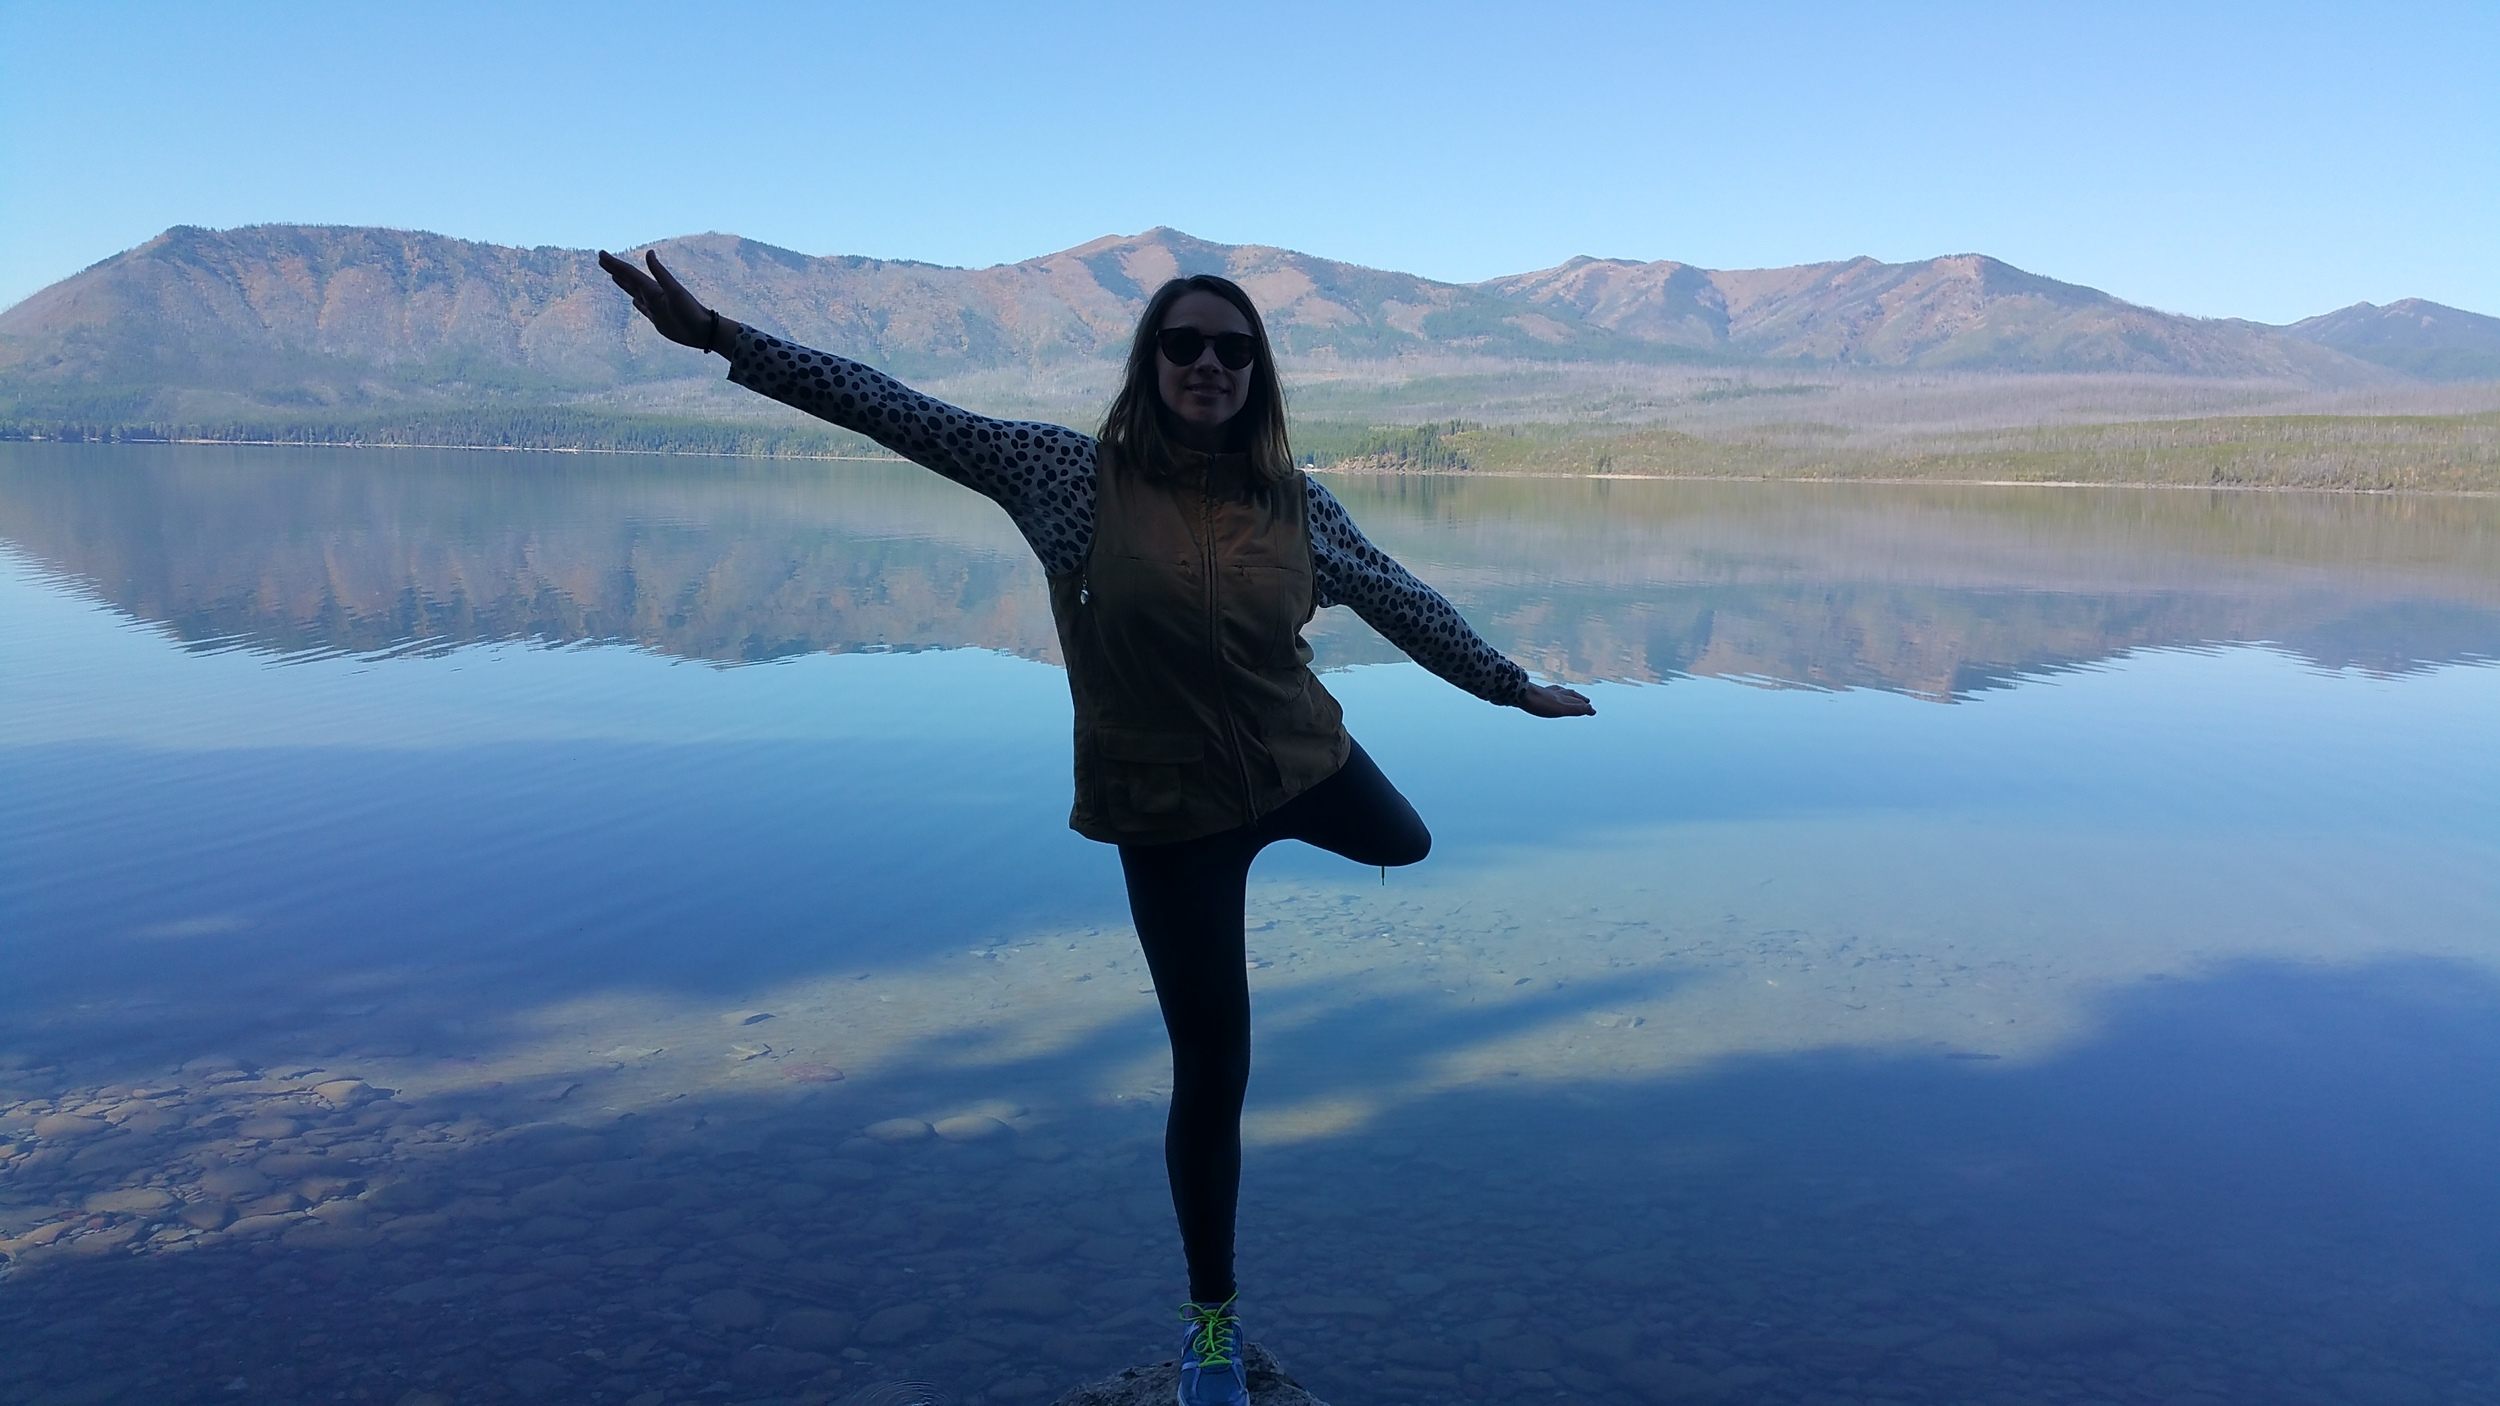 glacier-national-park-mirror-lake